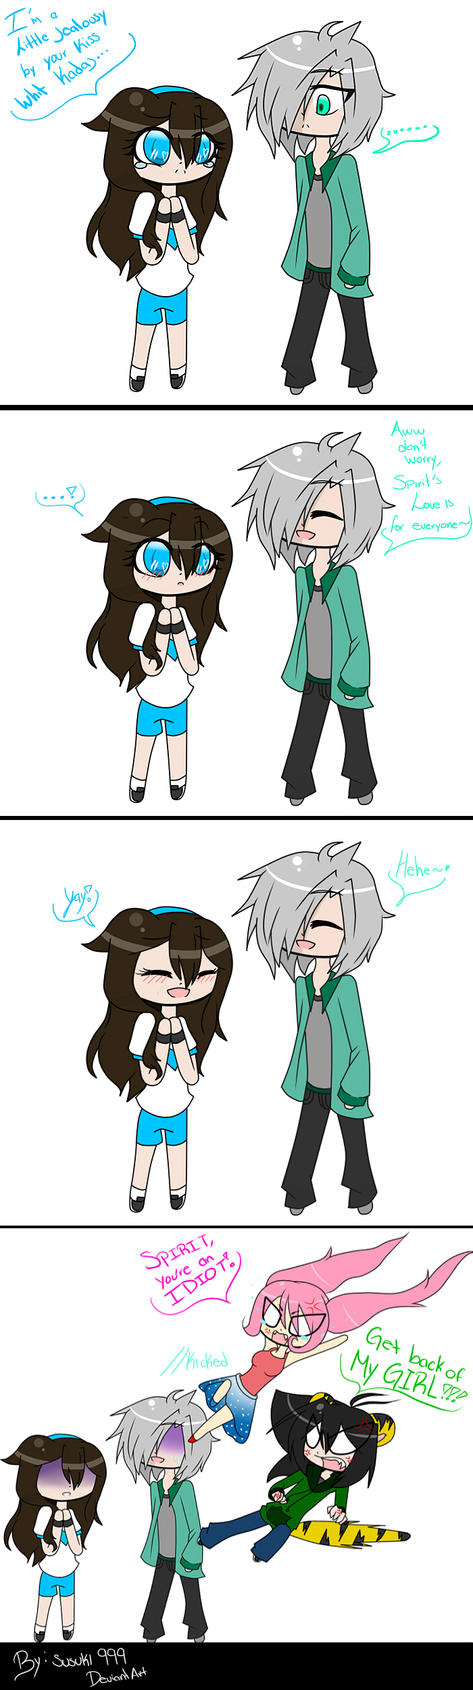 Susuki jealousy by susuki999